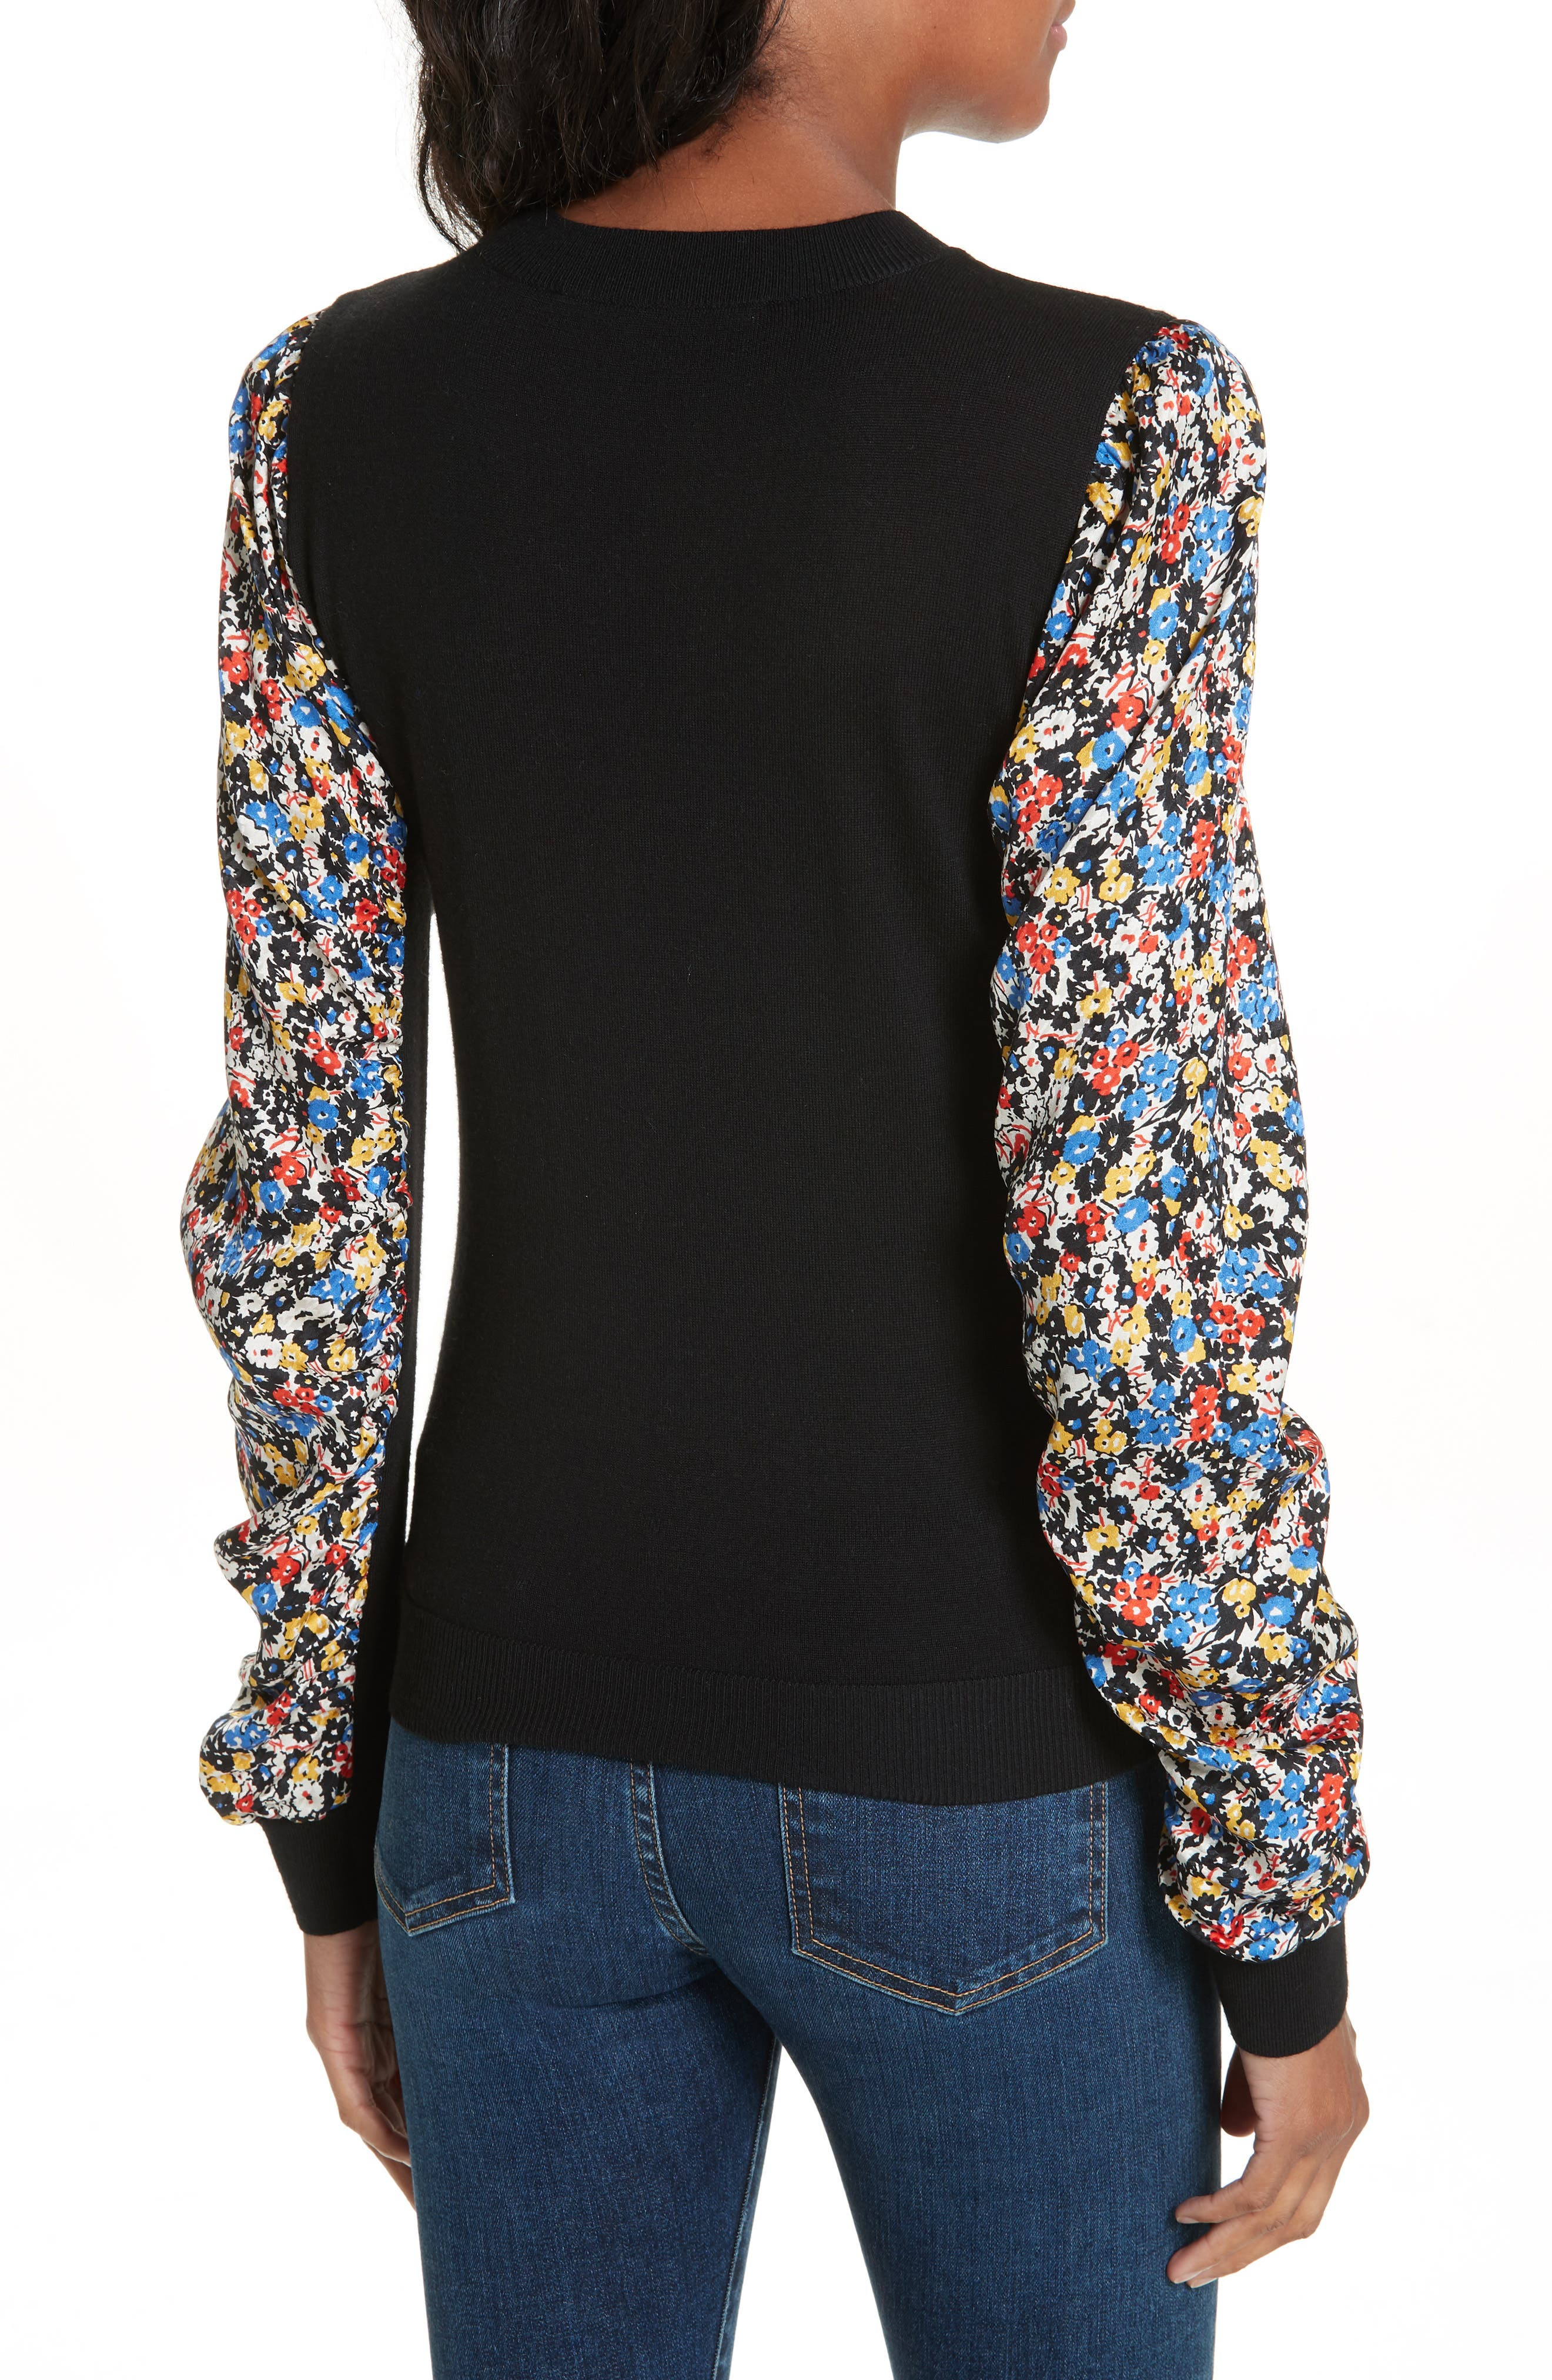 Adler Stretch Silk Sleeve Merino Wool Sweater,                             Alternate thumbnail 2, color,                             BLACK FLORAL